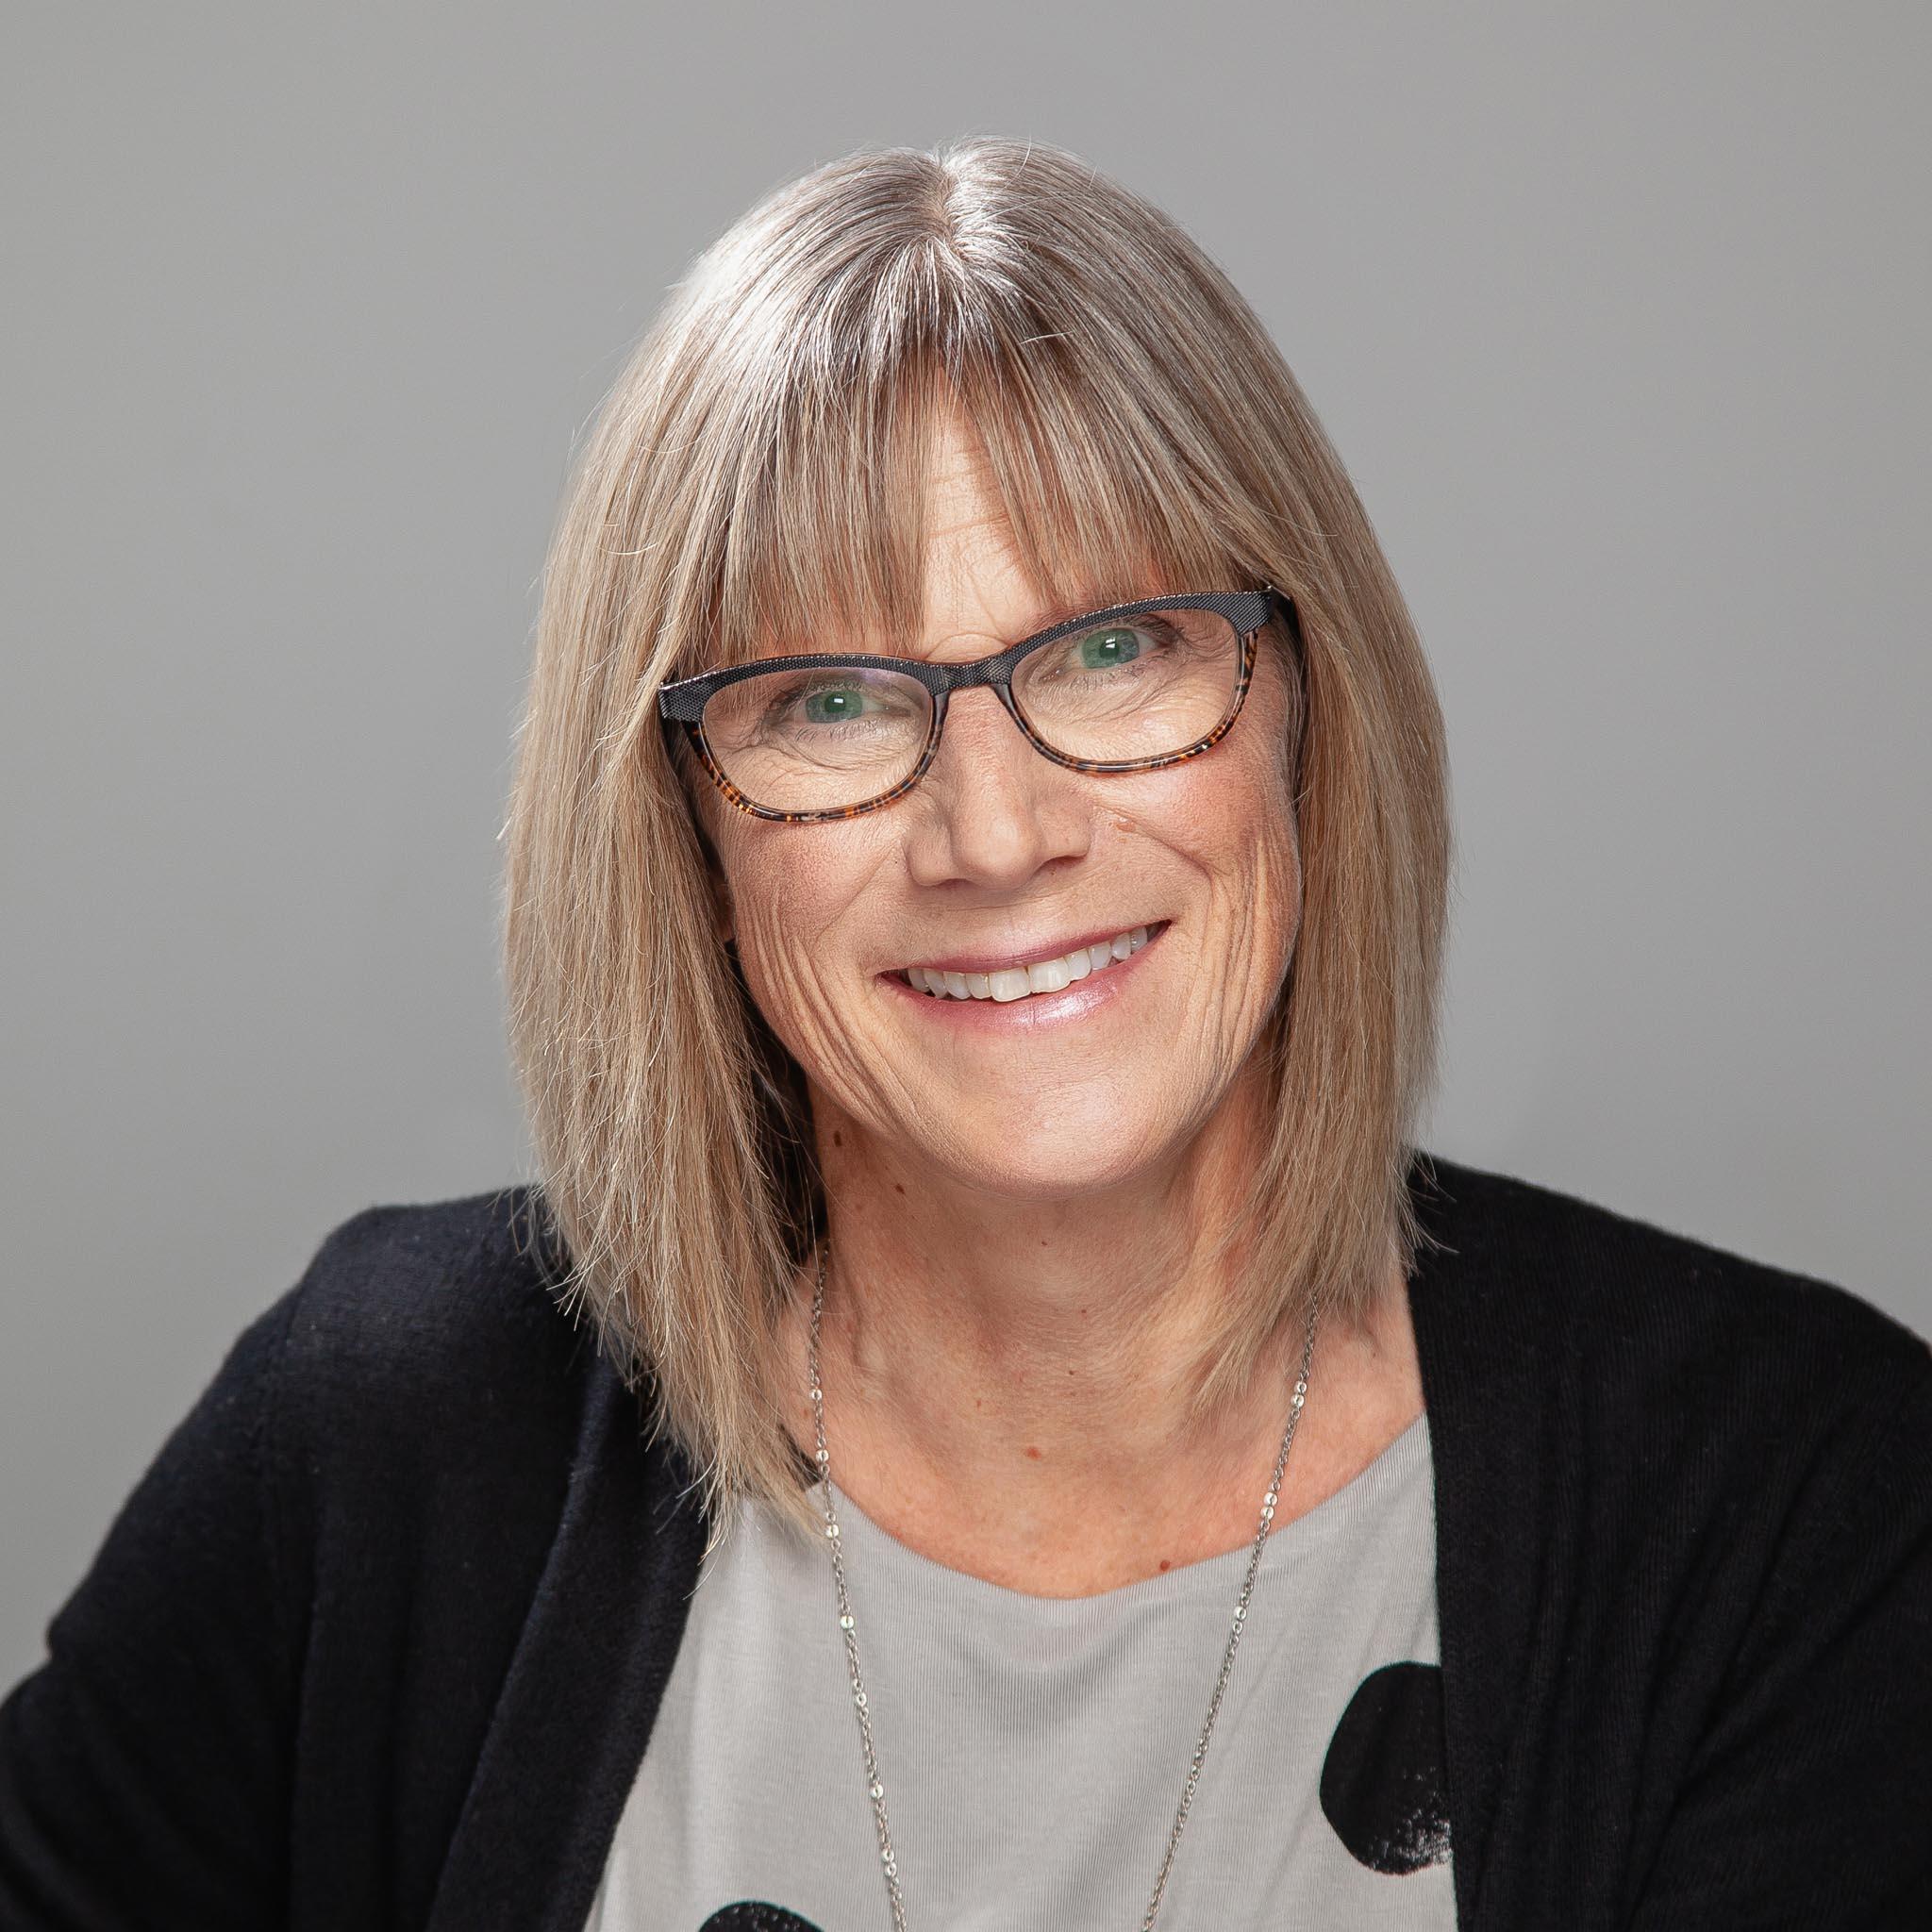 Sylvia Neerhof